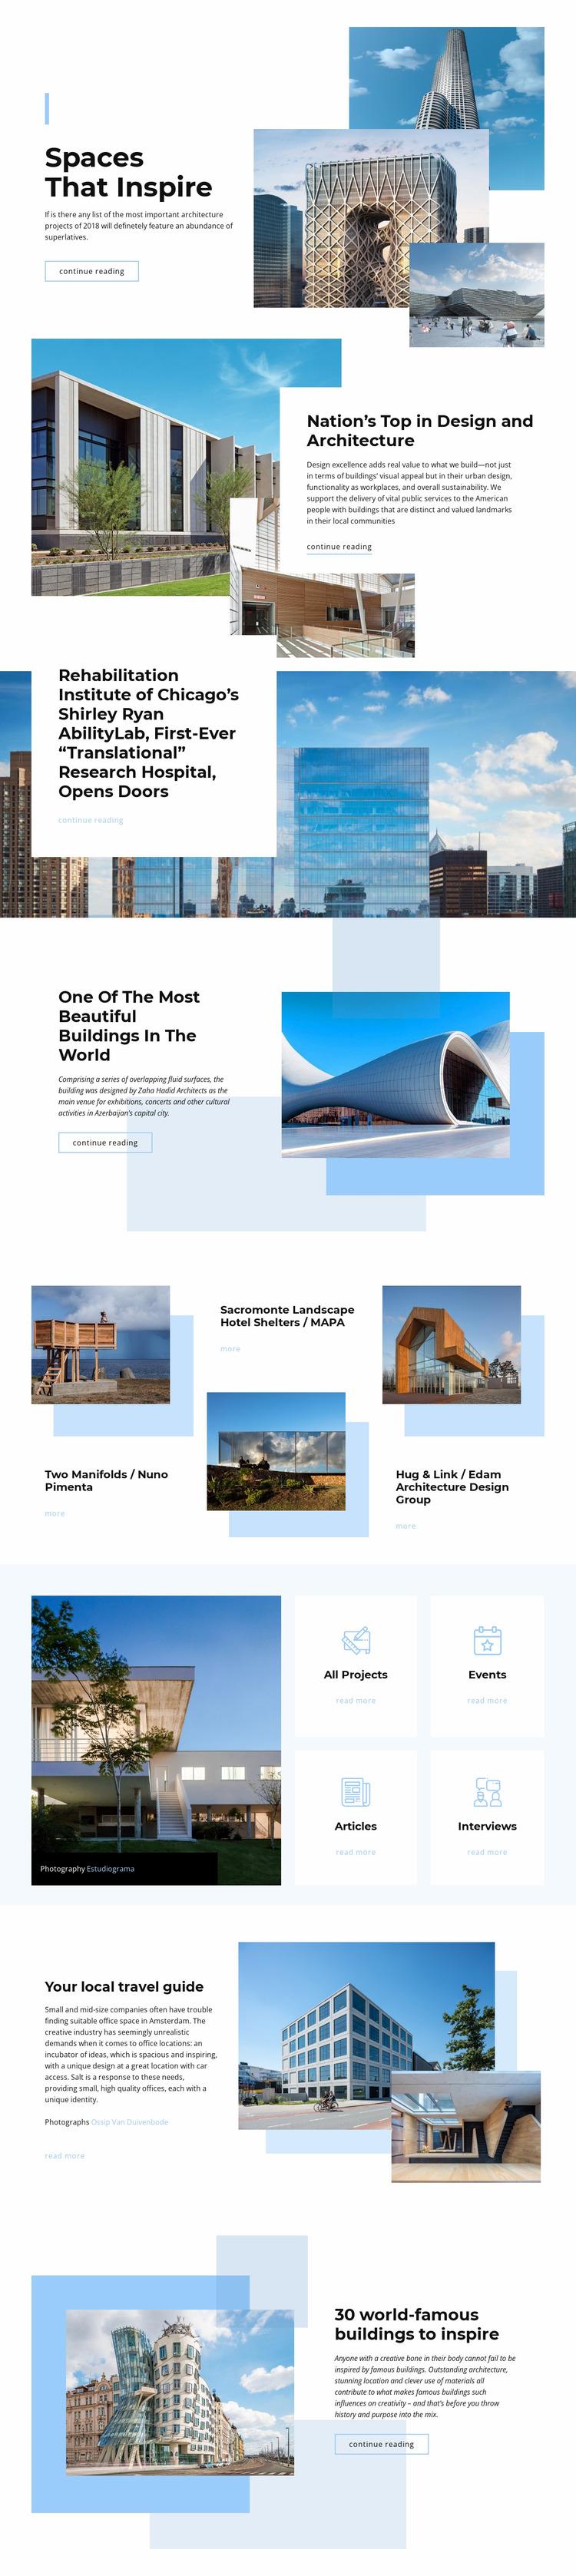 Spaces That Inspire Website Mockup